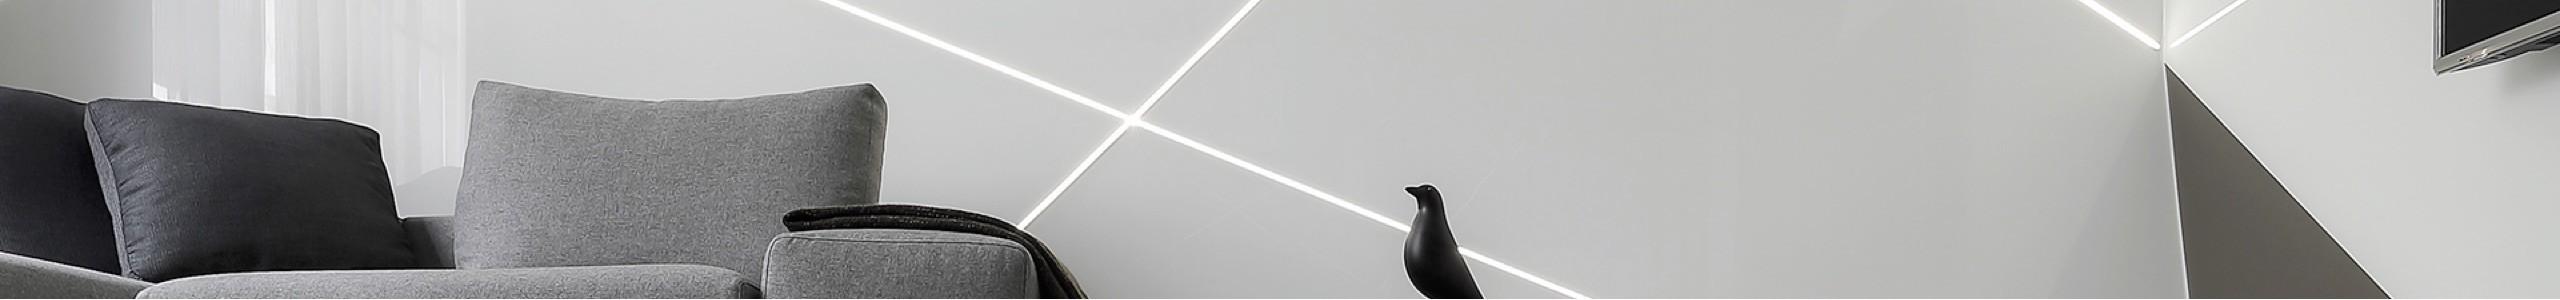 Perfiles LED